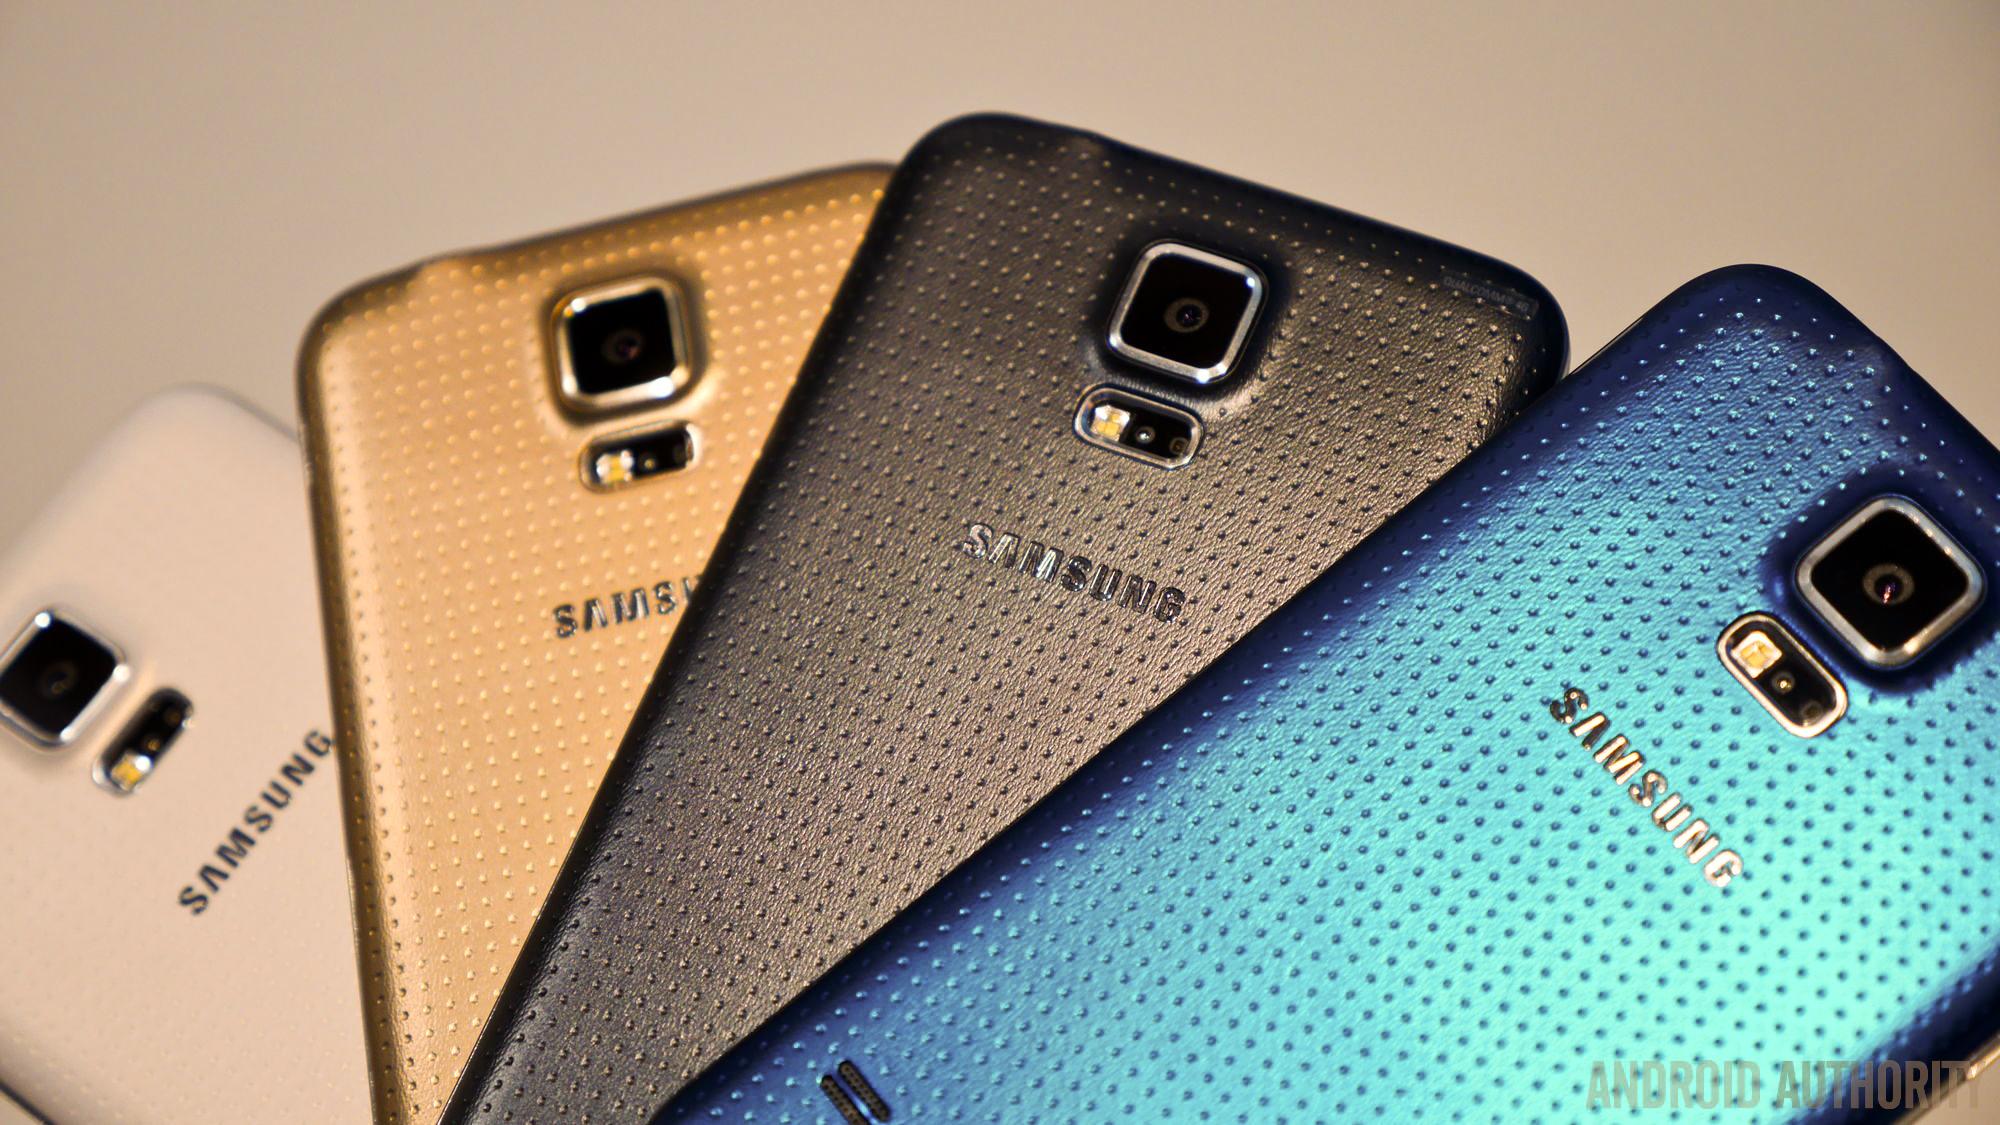 samsung galaxy s5 smartphones color options 5 - Color A Picture